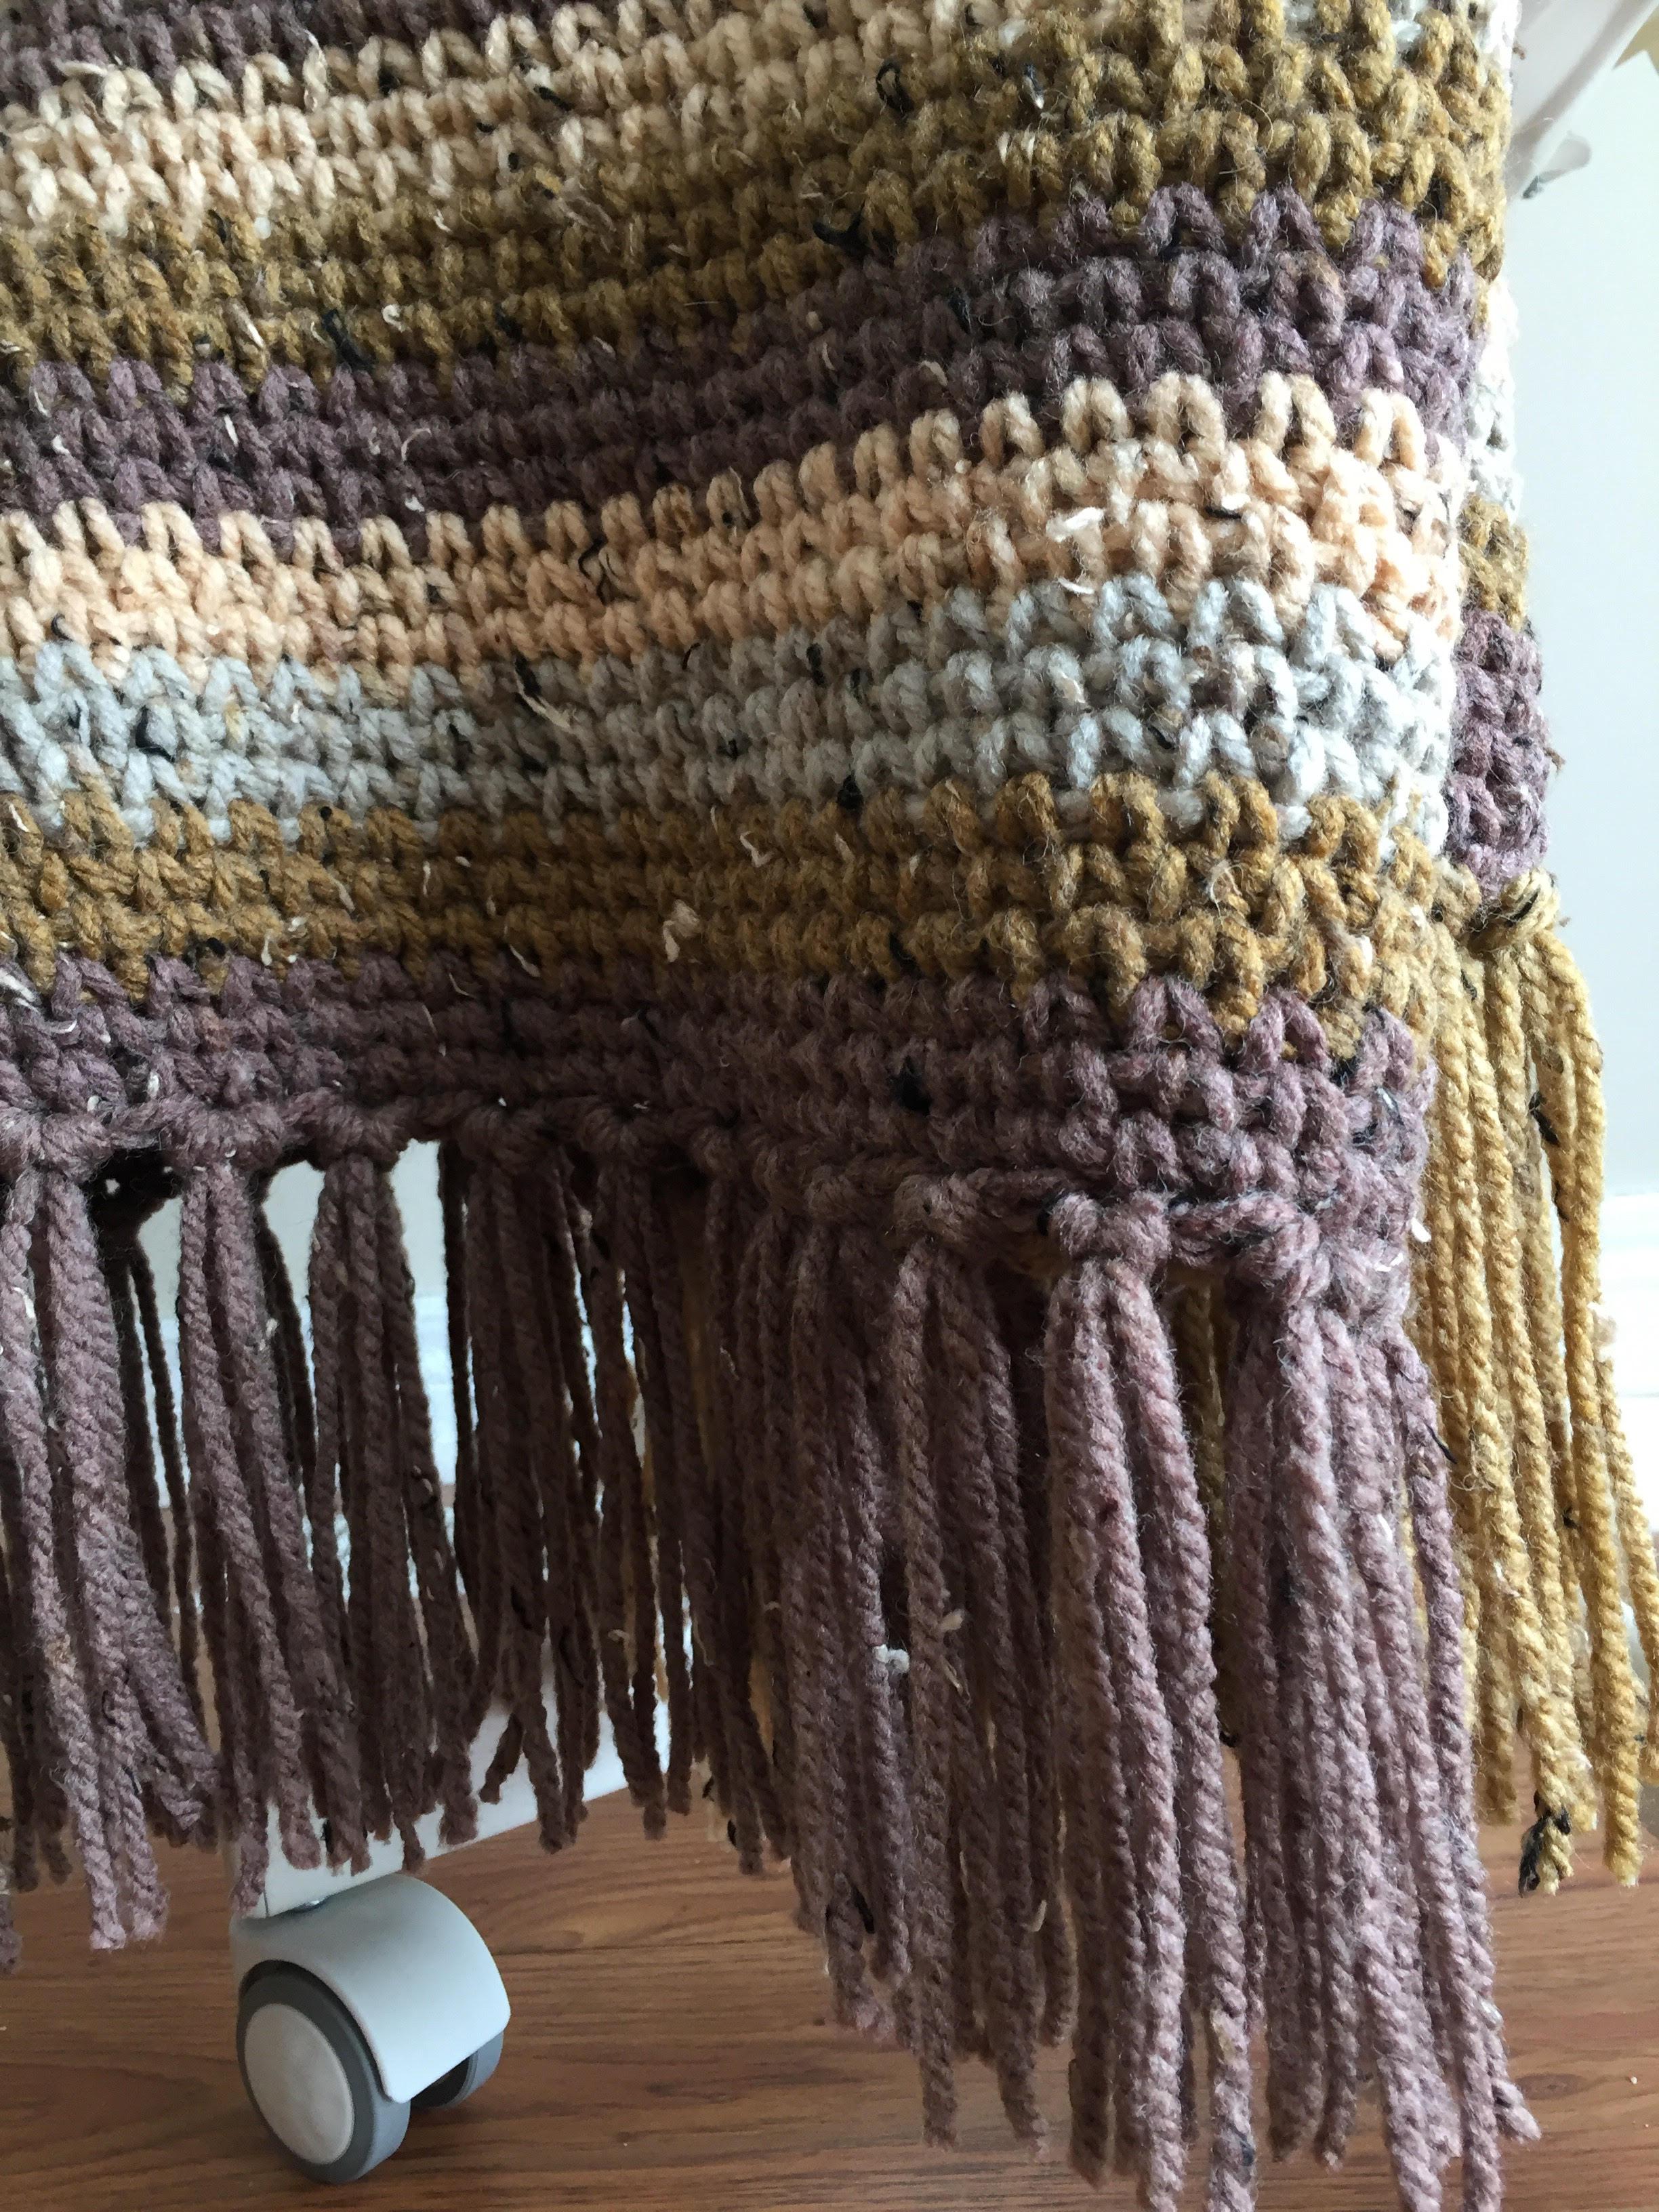 Crochet blanket in the waistcoat stitch